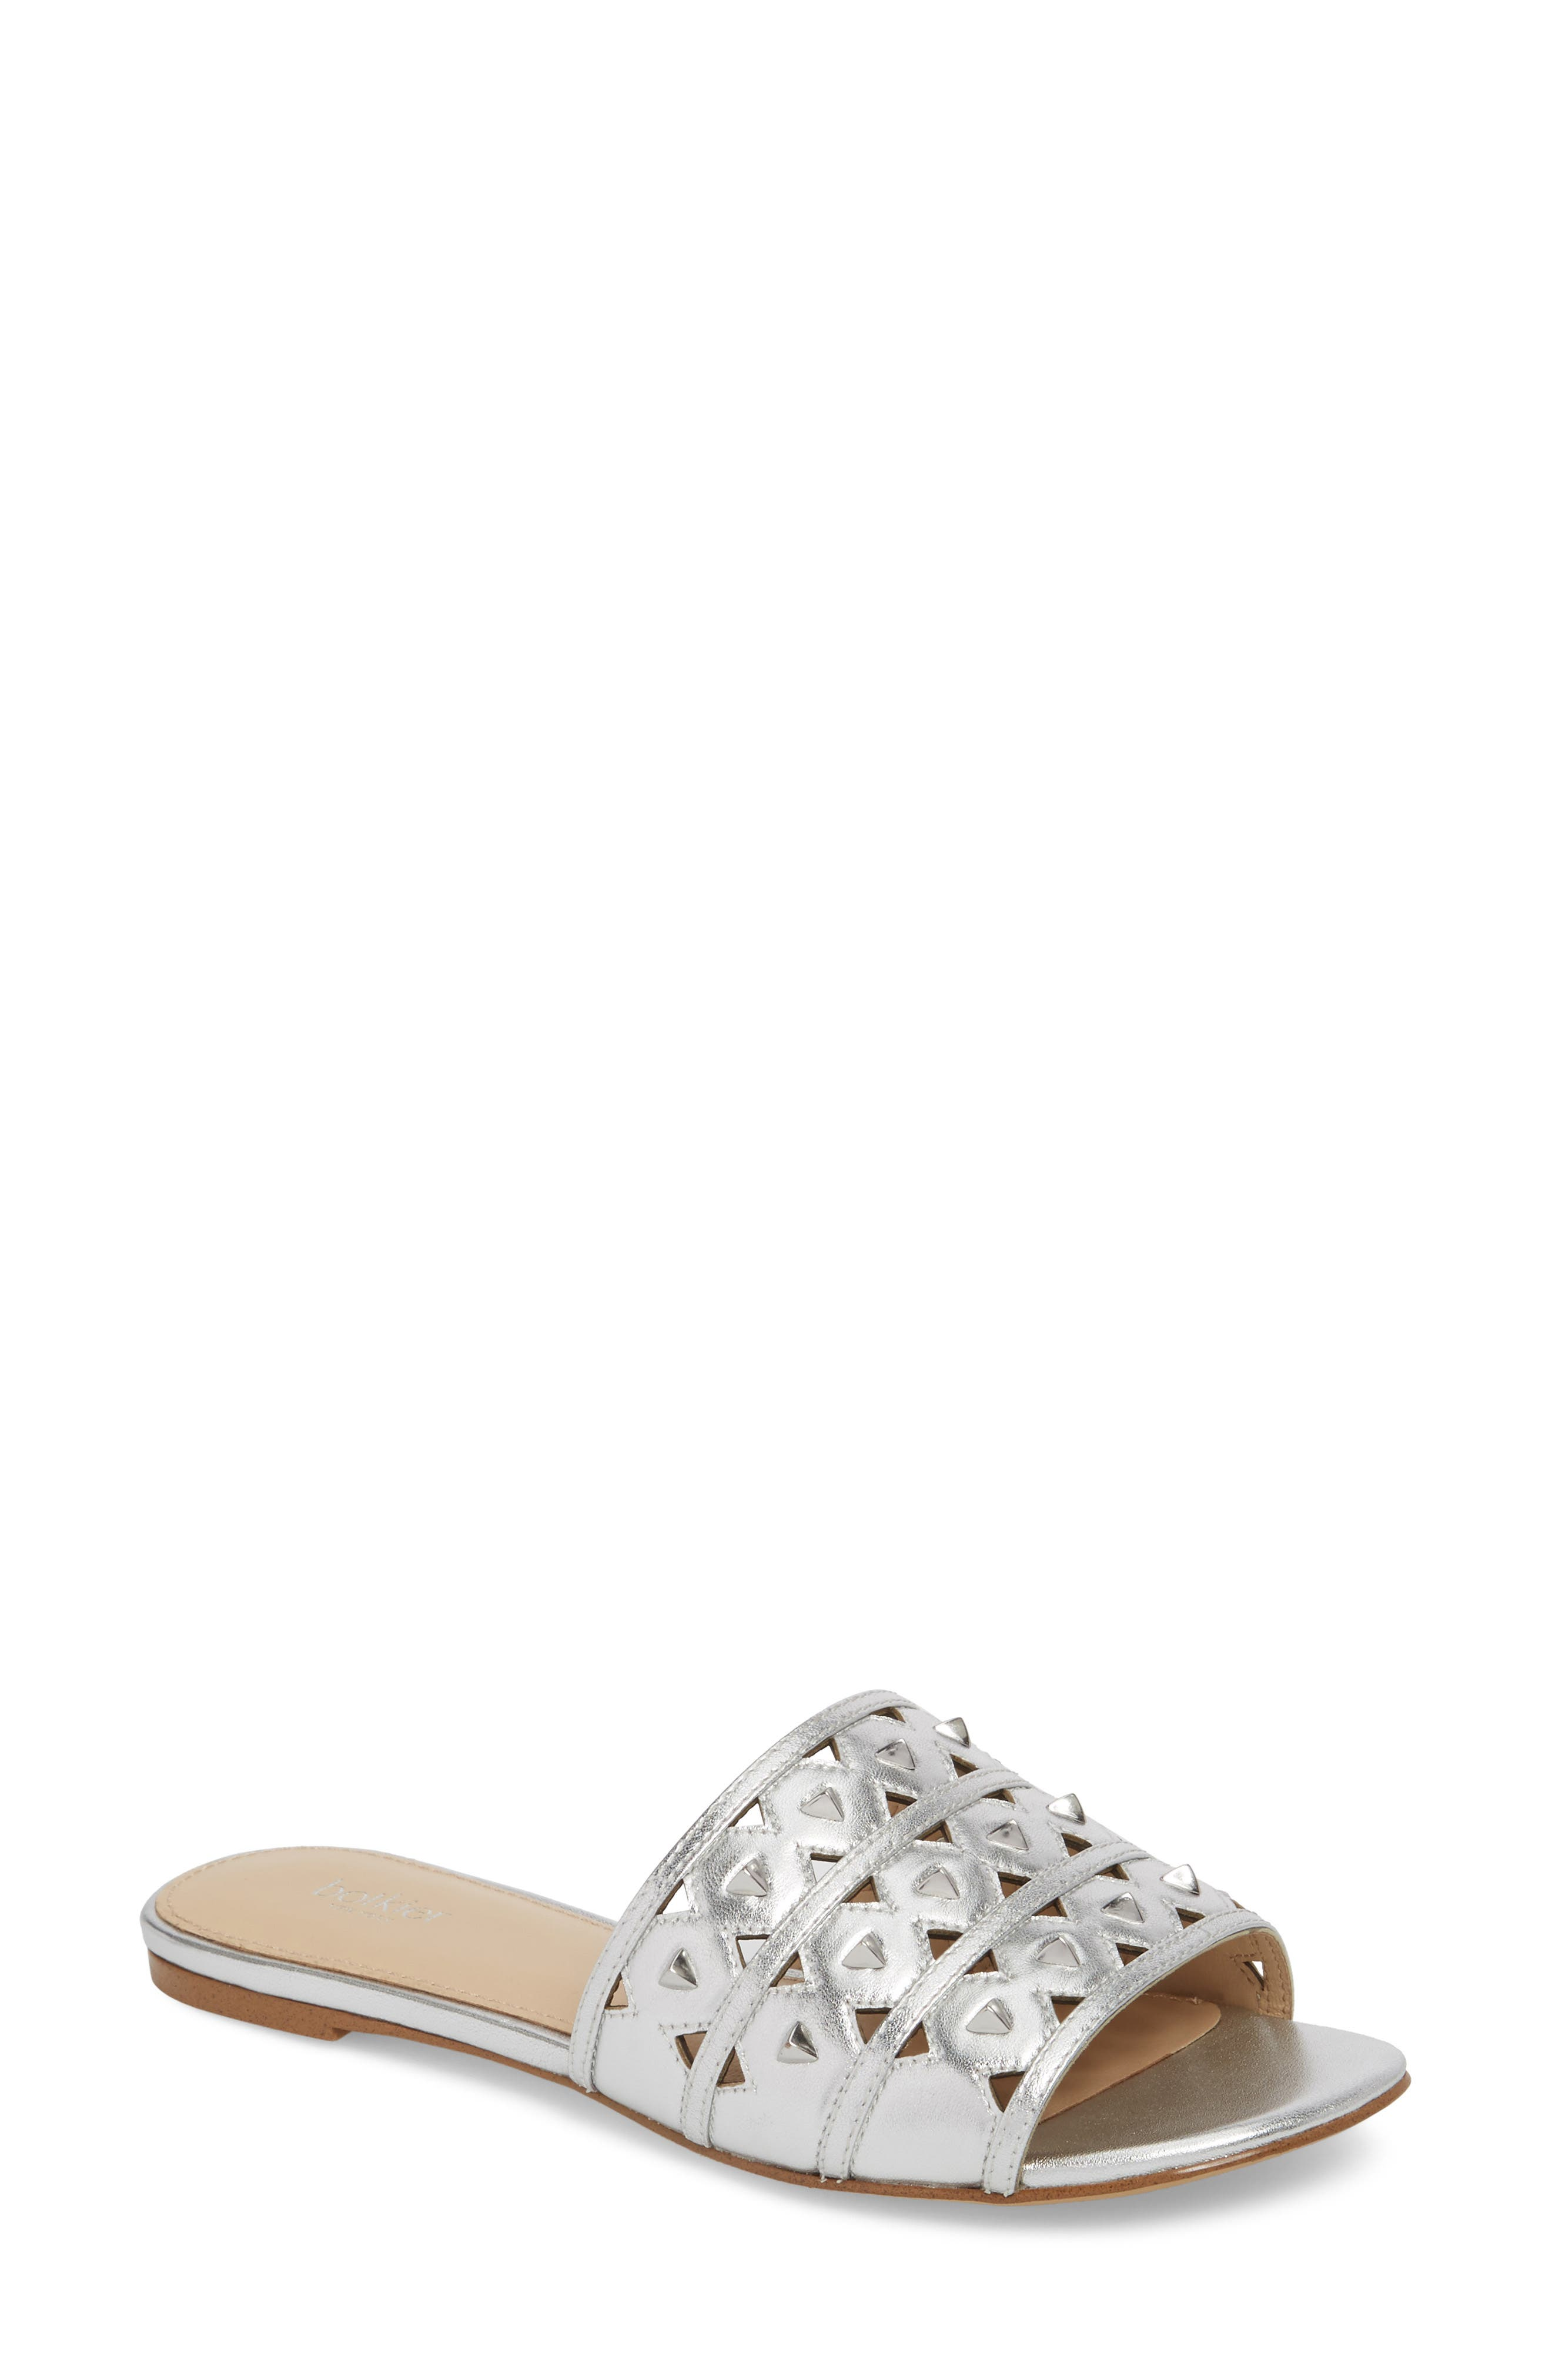 Maeva Slide Sandal,                             Main thumbnail 1, color,                             Argento Leather